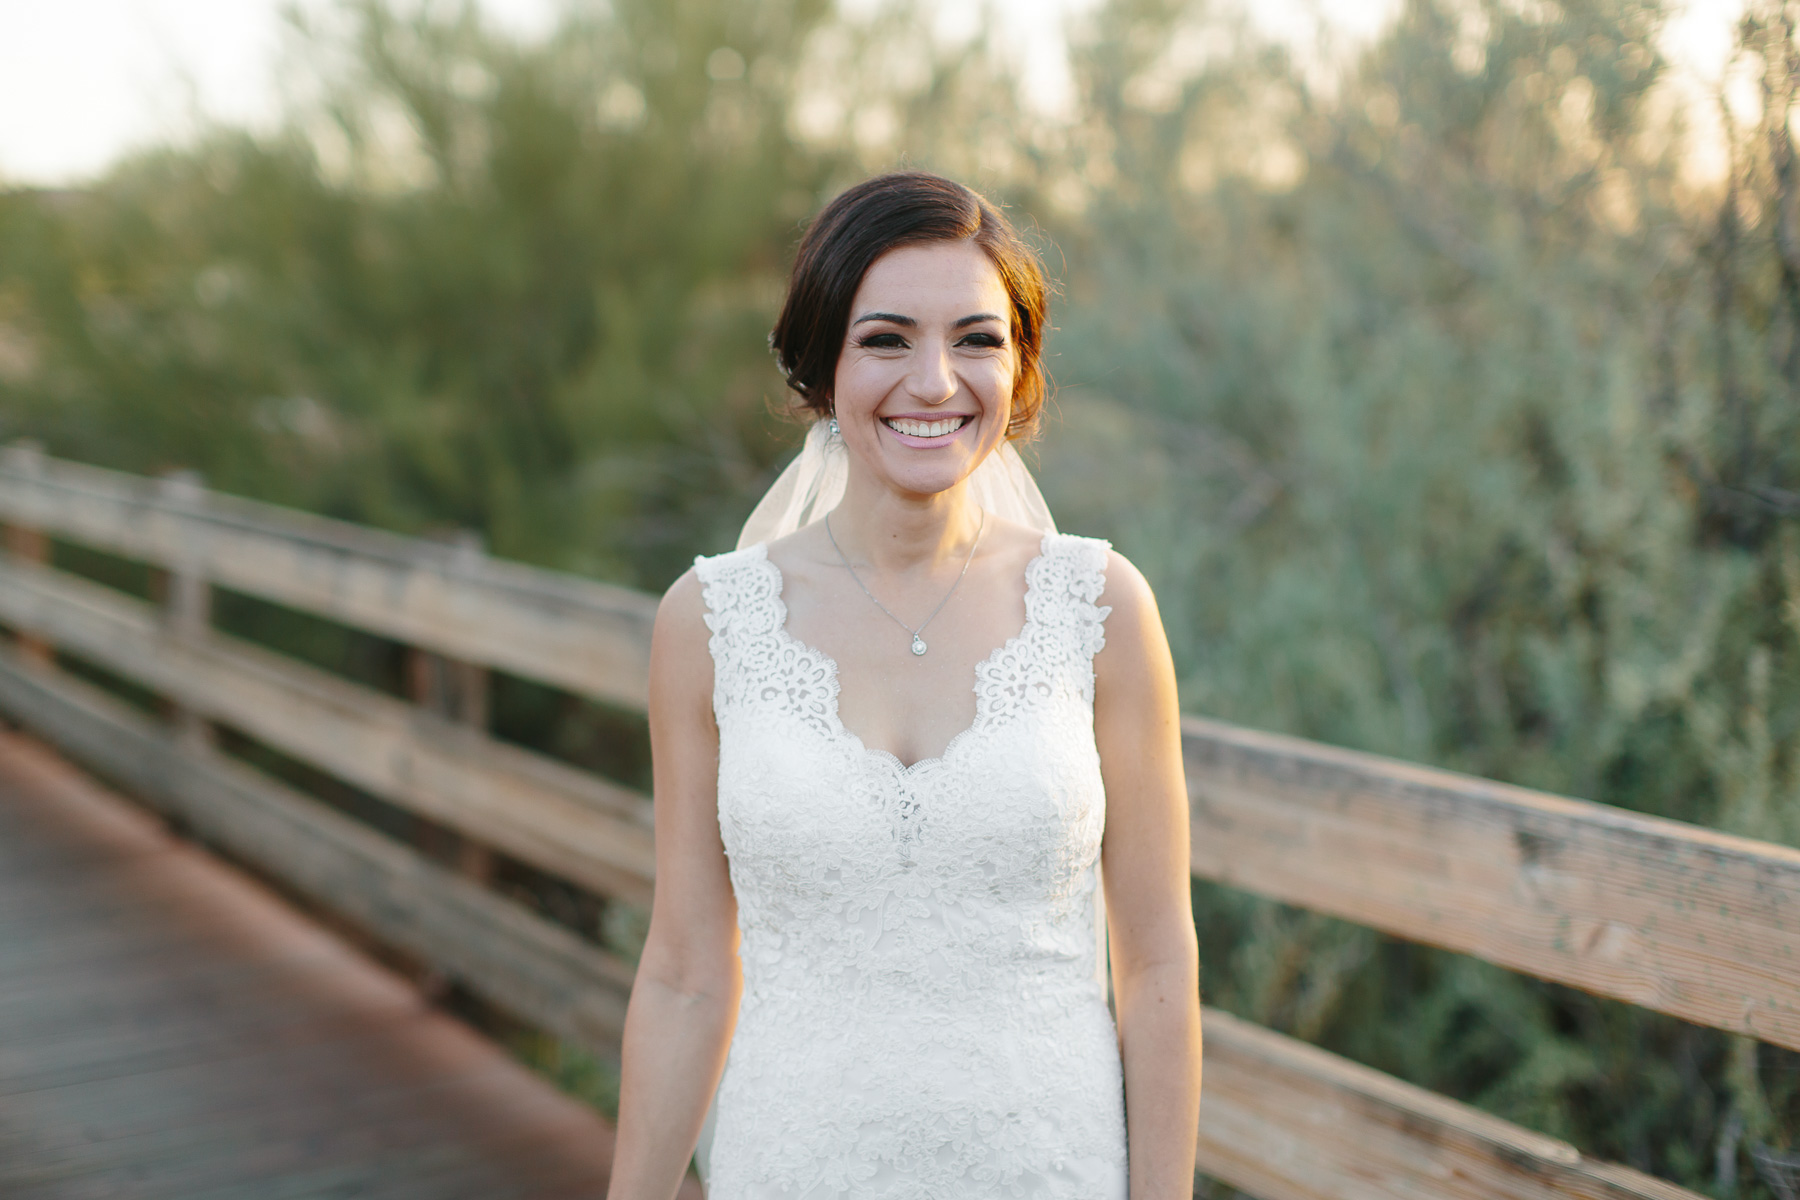 161210-Luxium-Weddings-Arizona-Matt-Jenny-Anthem-Golf-Country-Club-1054.jpg